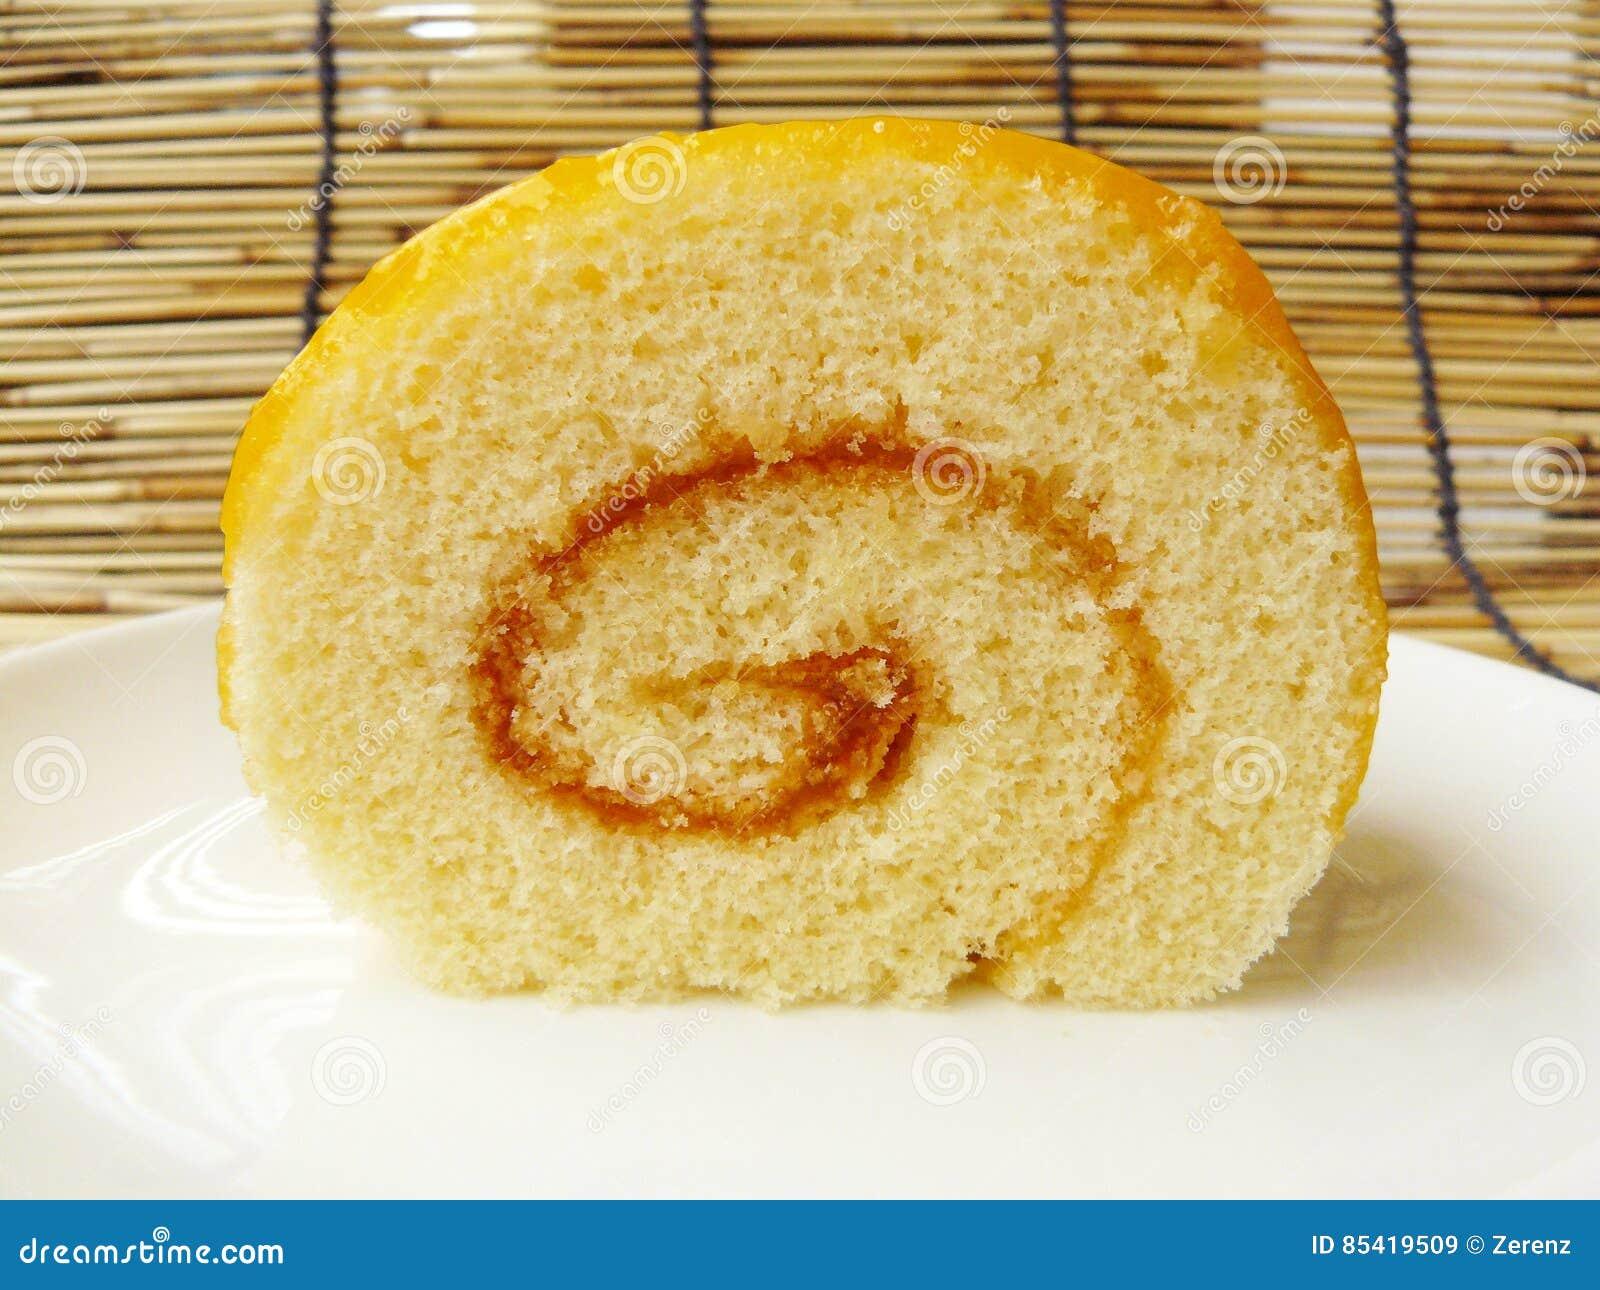 Cartoon Jelly Cake Recipe: Orange Cake Roll Royalty-Free Stock Photography